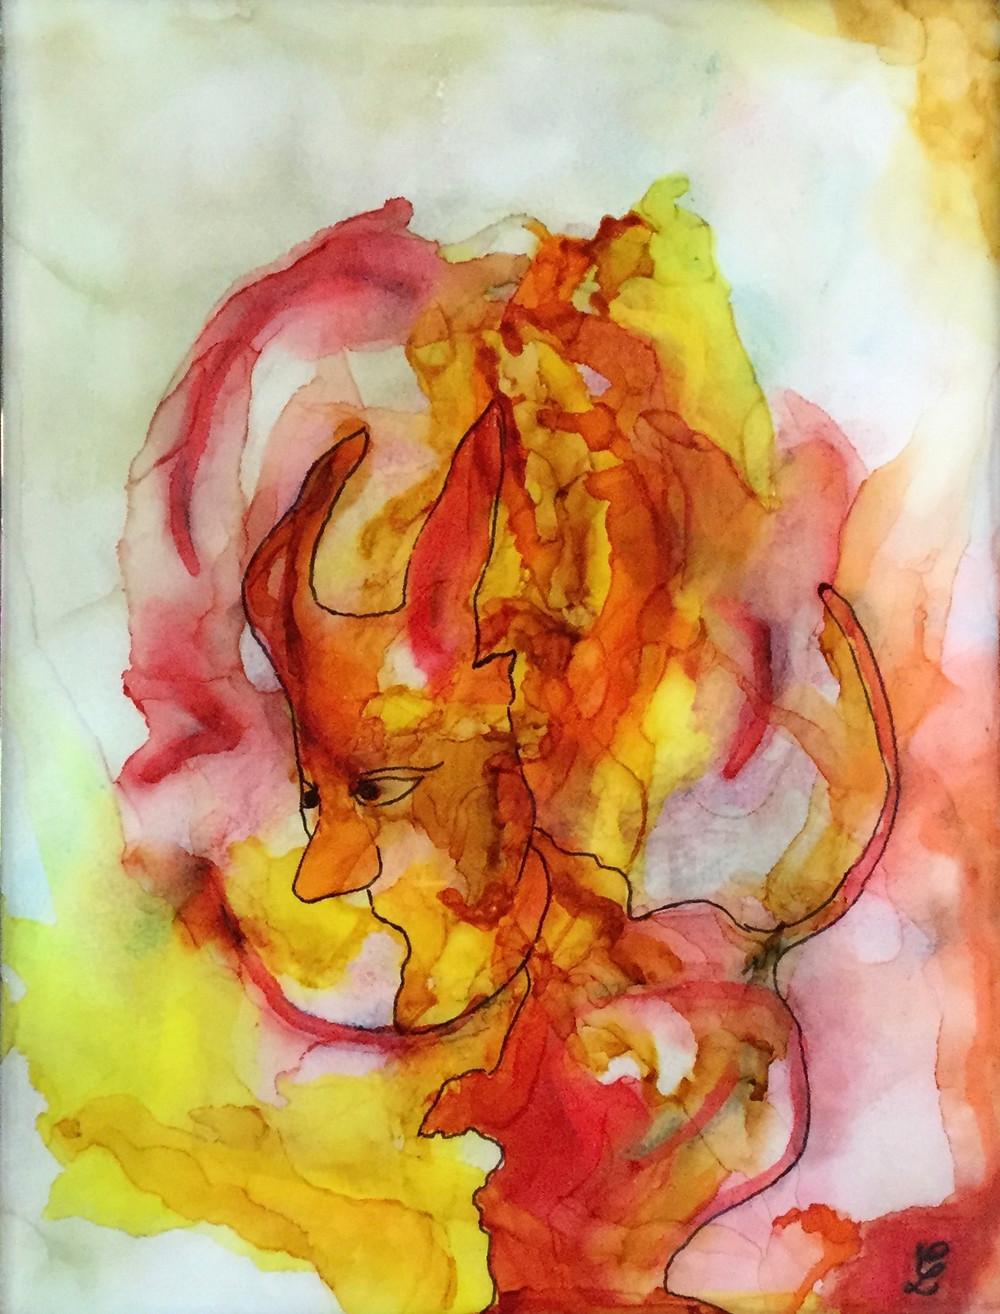 Efreeti by Claudia Lohmann